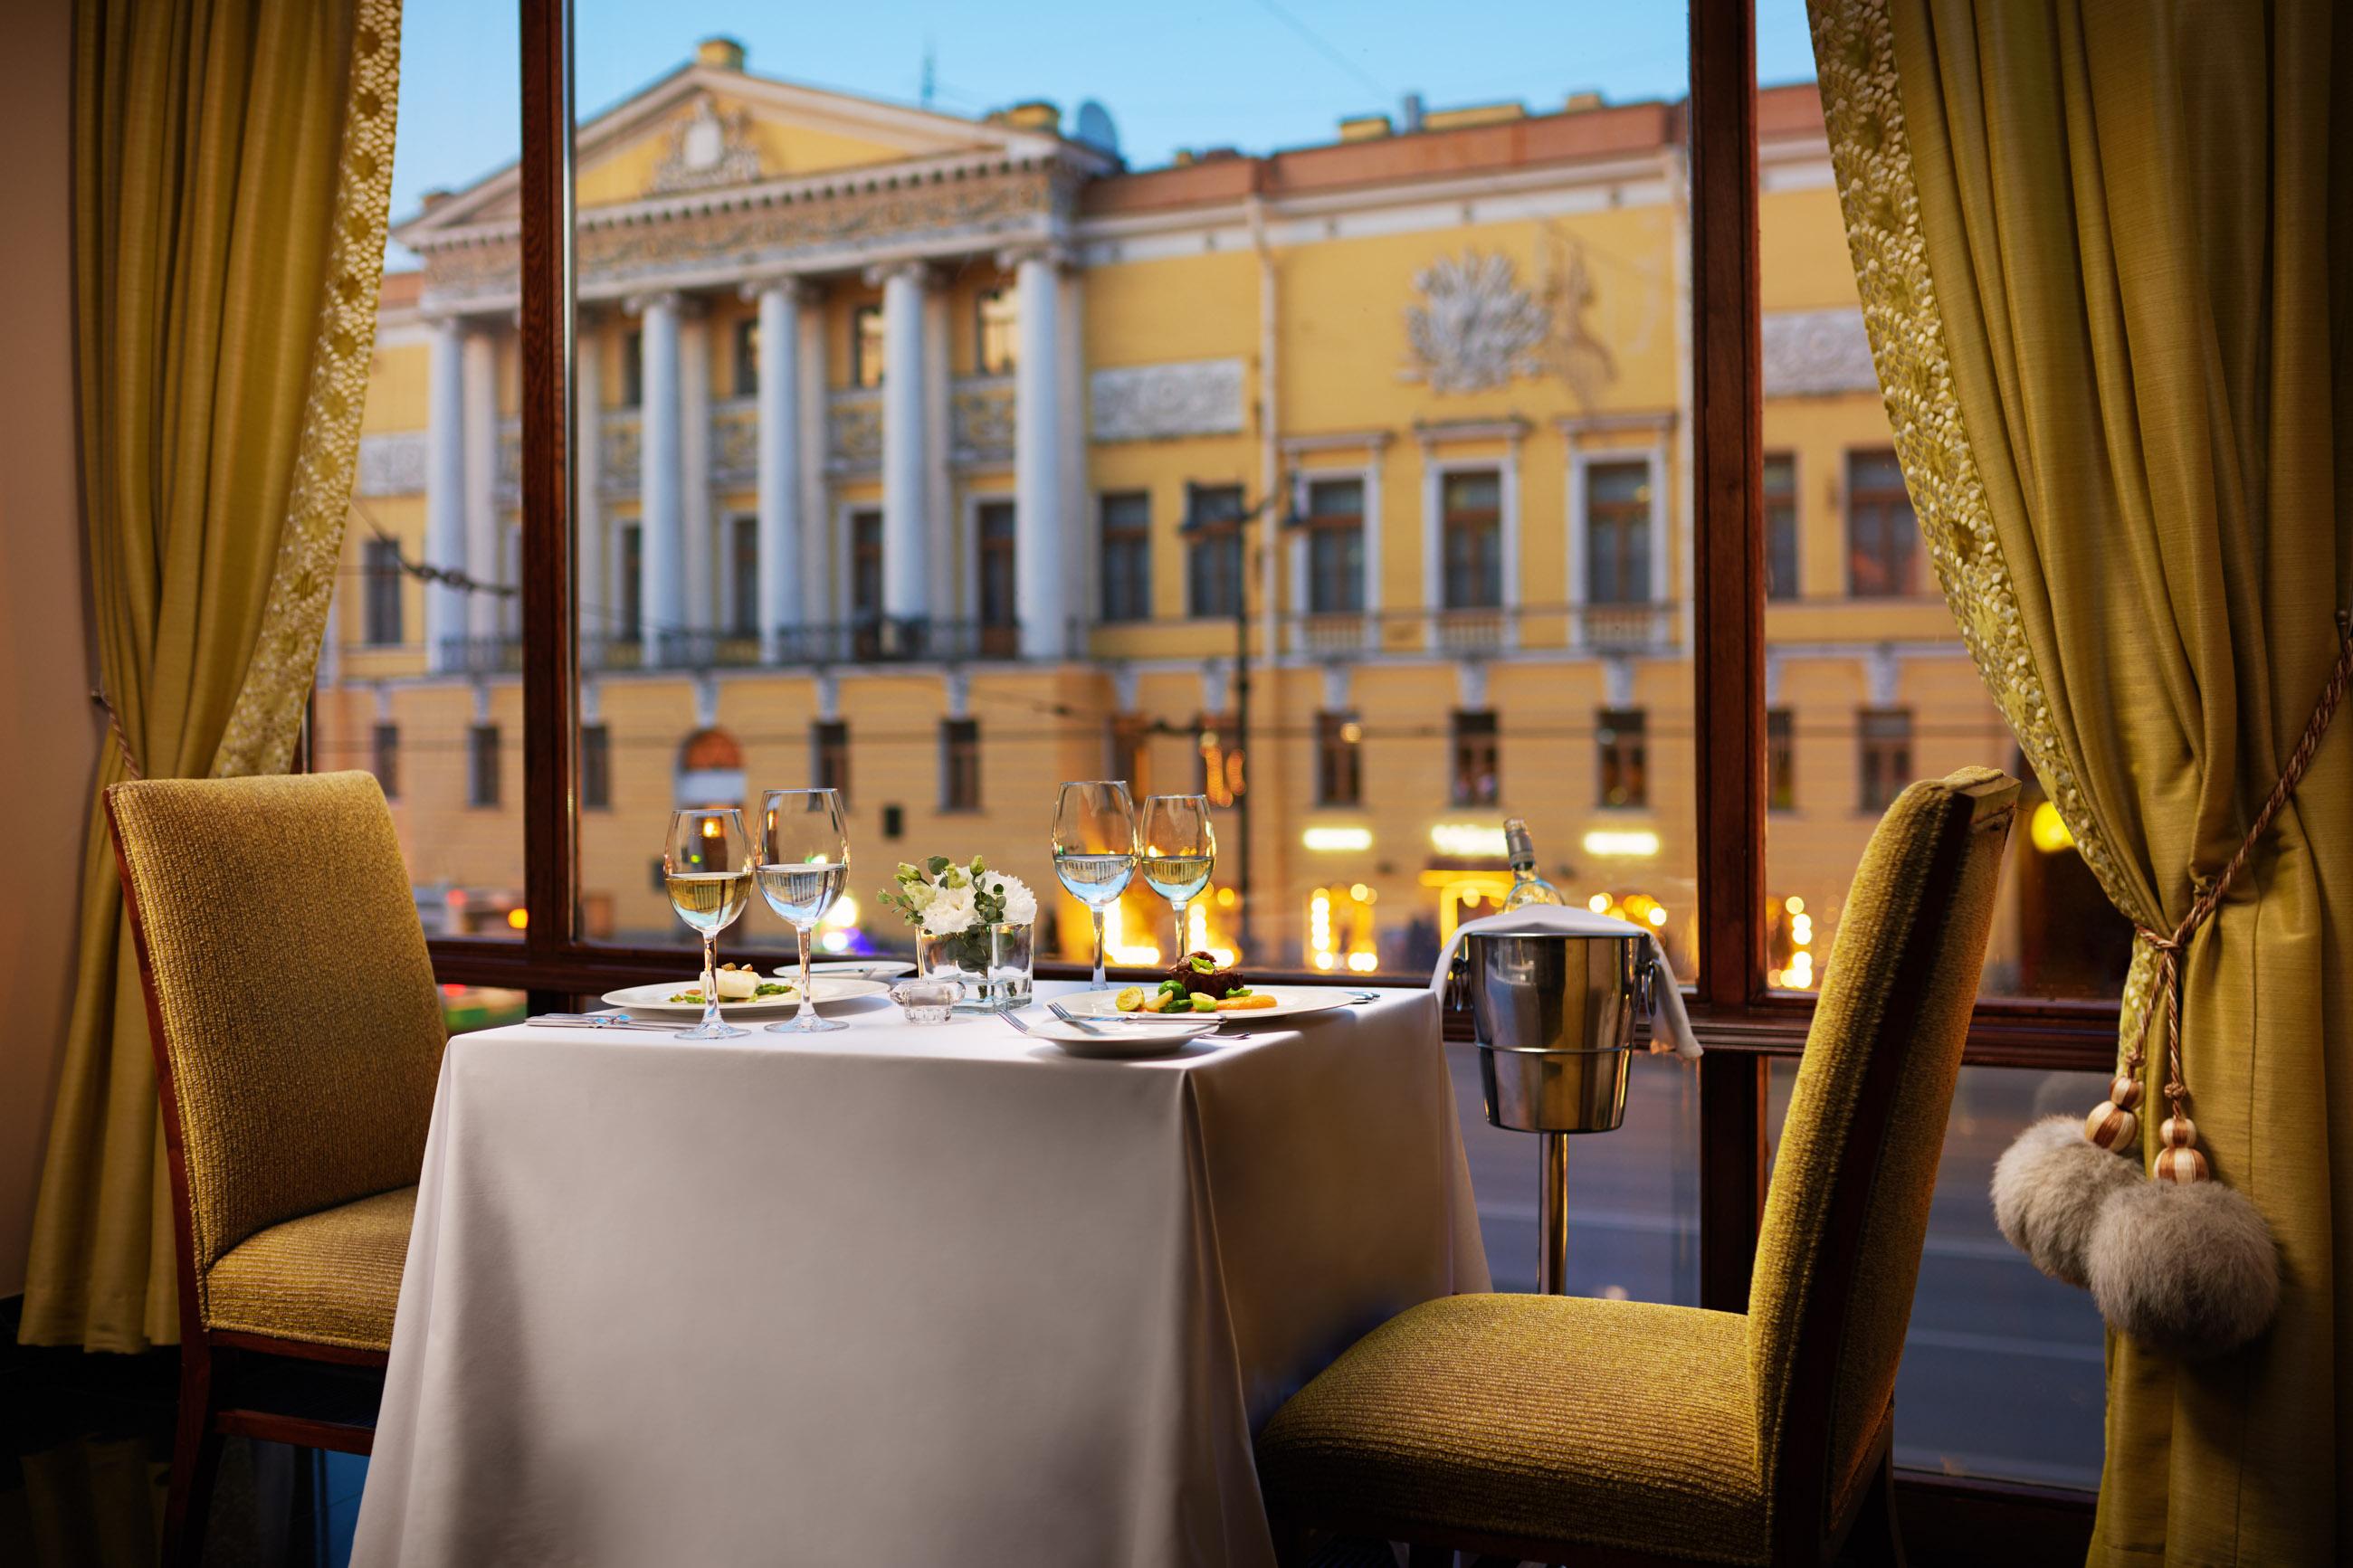 https://bubo.sk/uploads/galleries/5056/corinthia_st_petersburg_imperialrestaurant.jpg